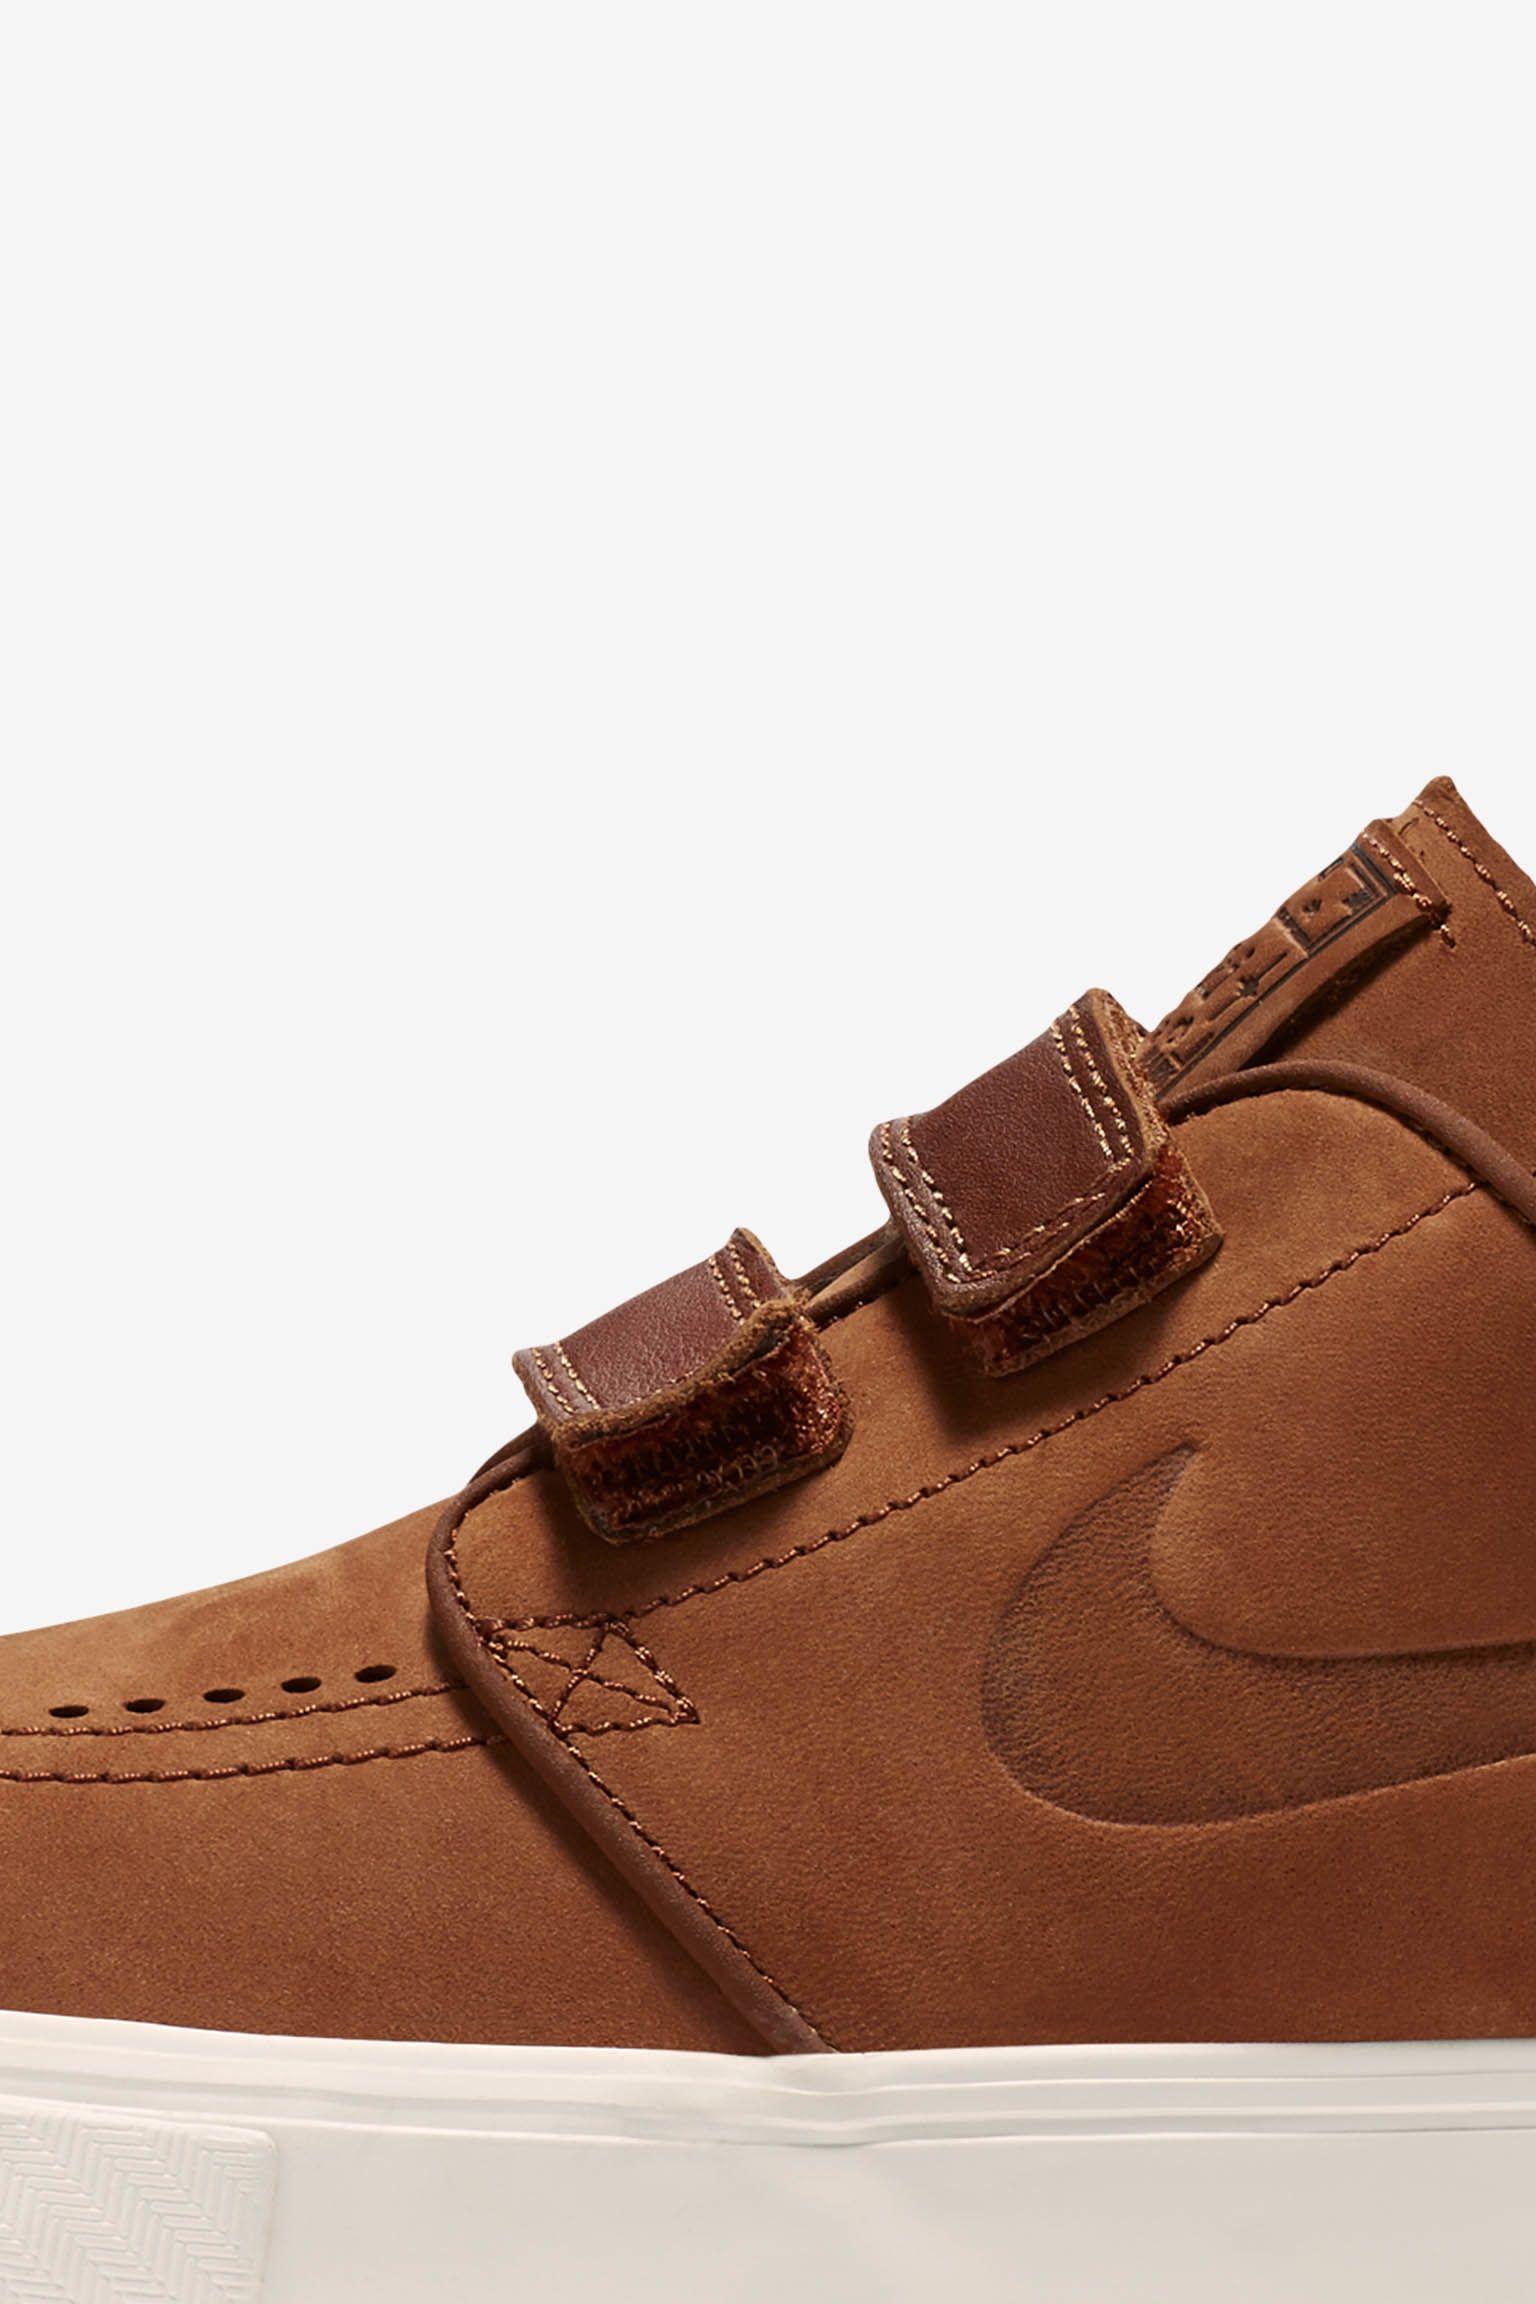 Nike SB Zoom Stefan Janoski Premium AC 'Baroque Brown'